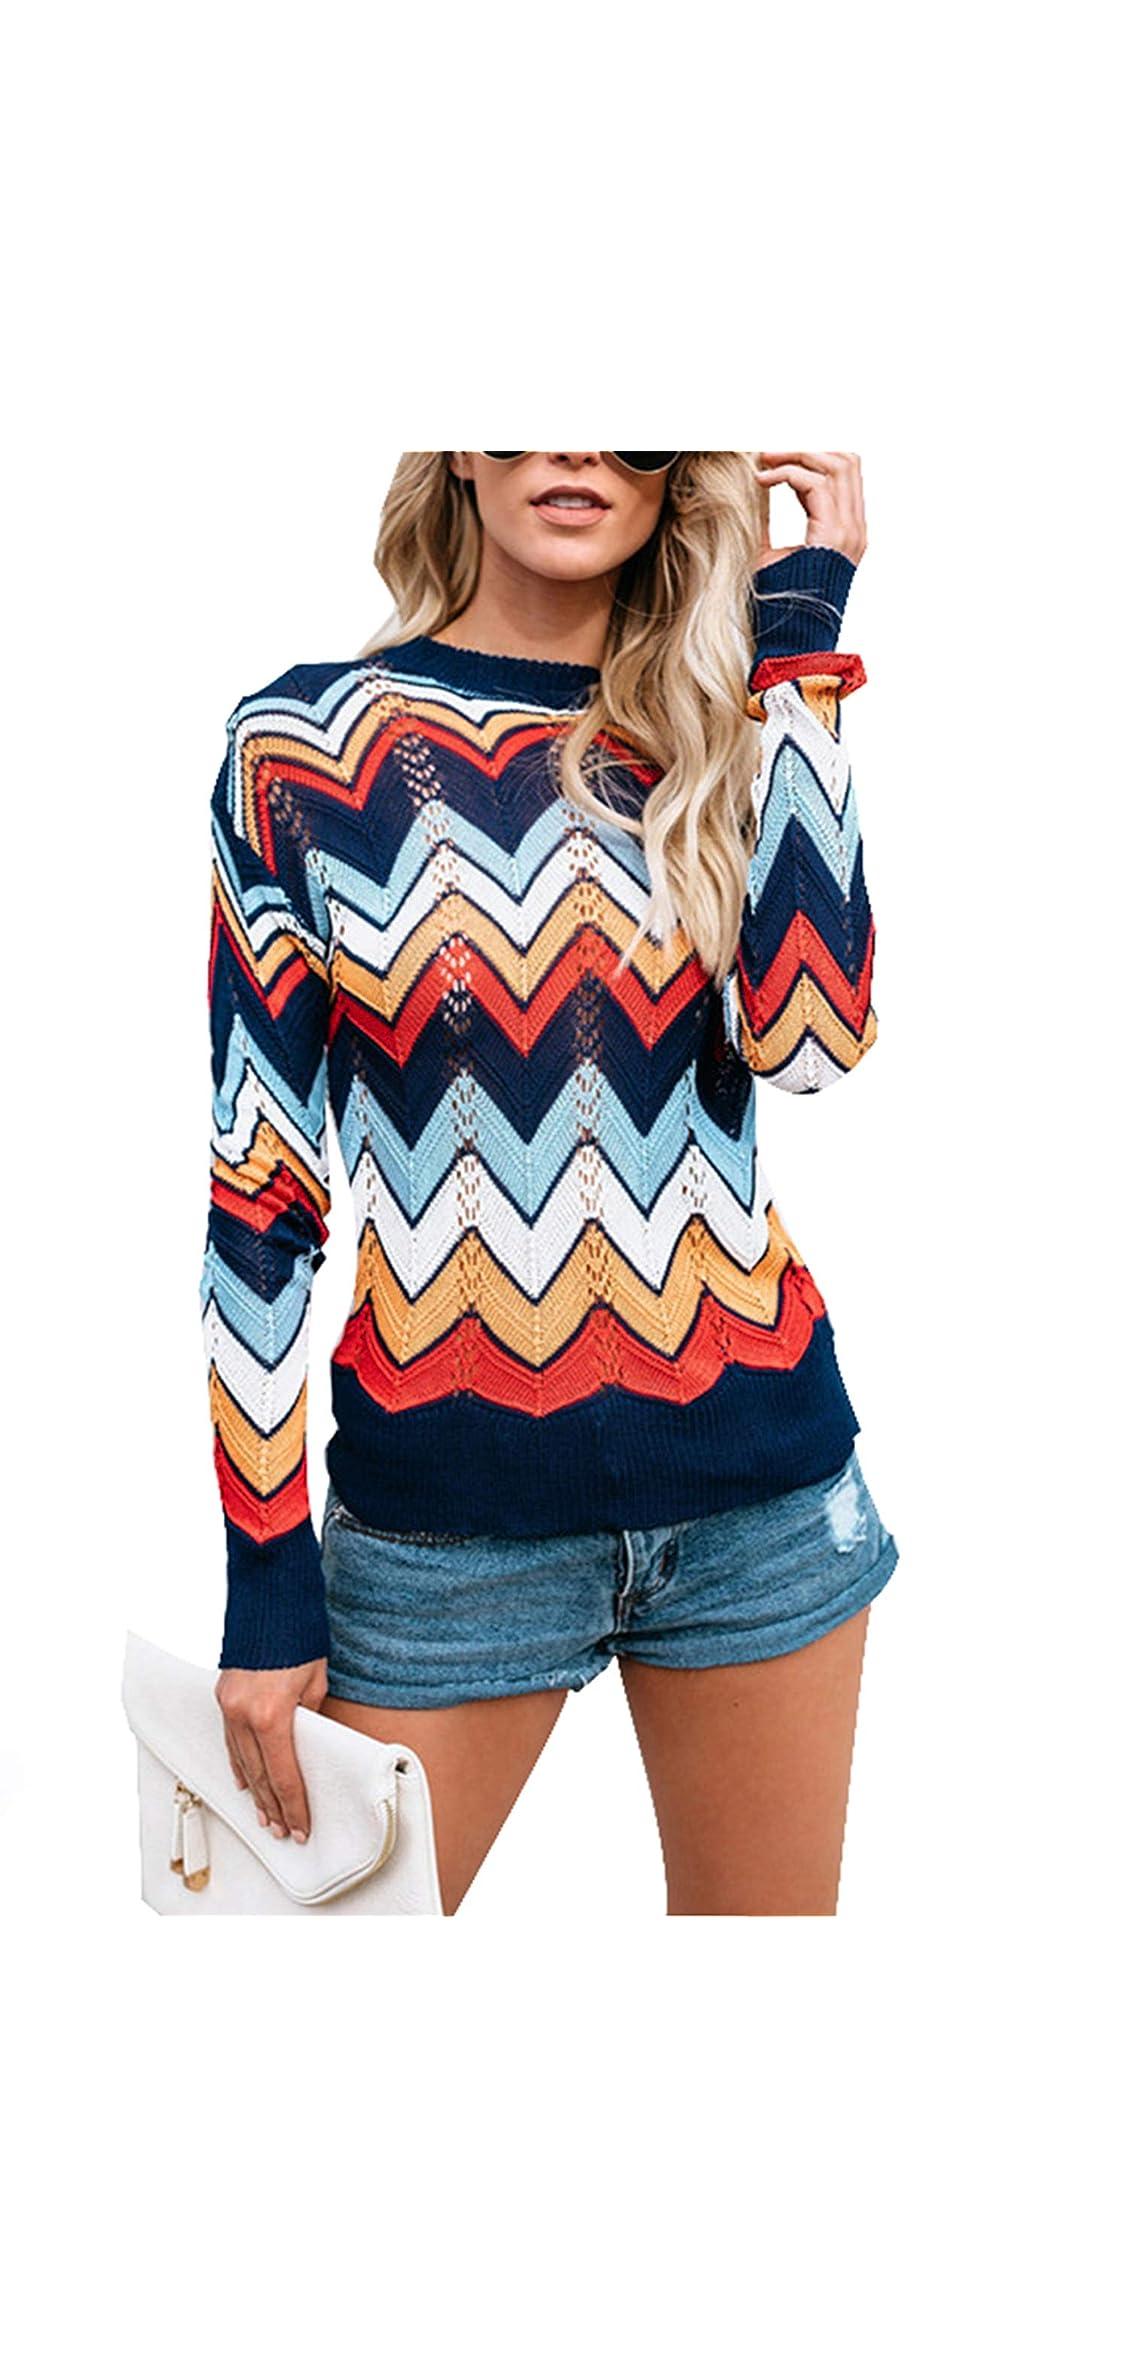 Women's Pullover Jumper Crewneck Rainbow Color Striped